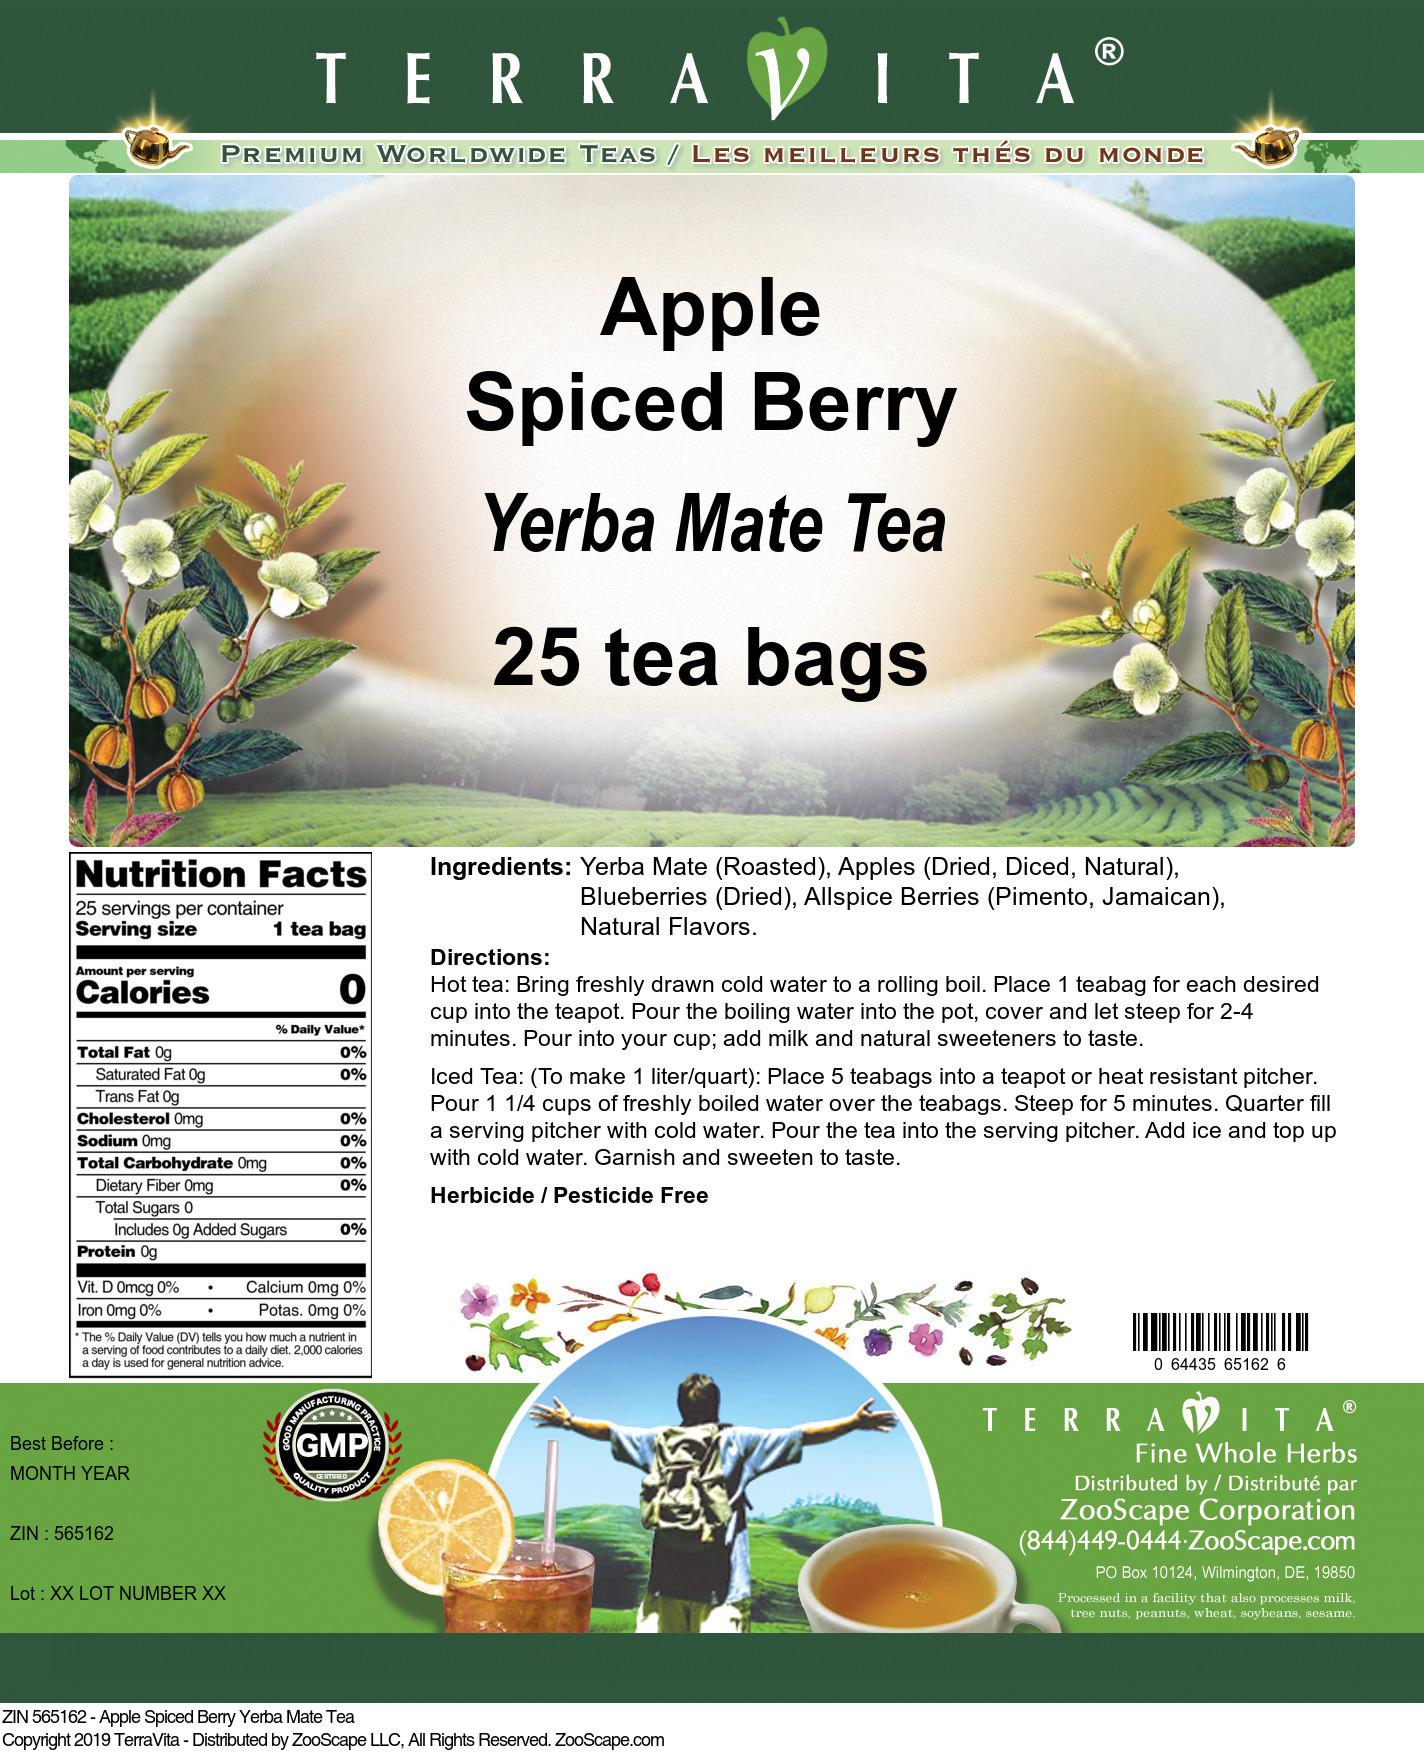 Apple Spiced Berry Yerba Mate